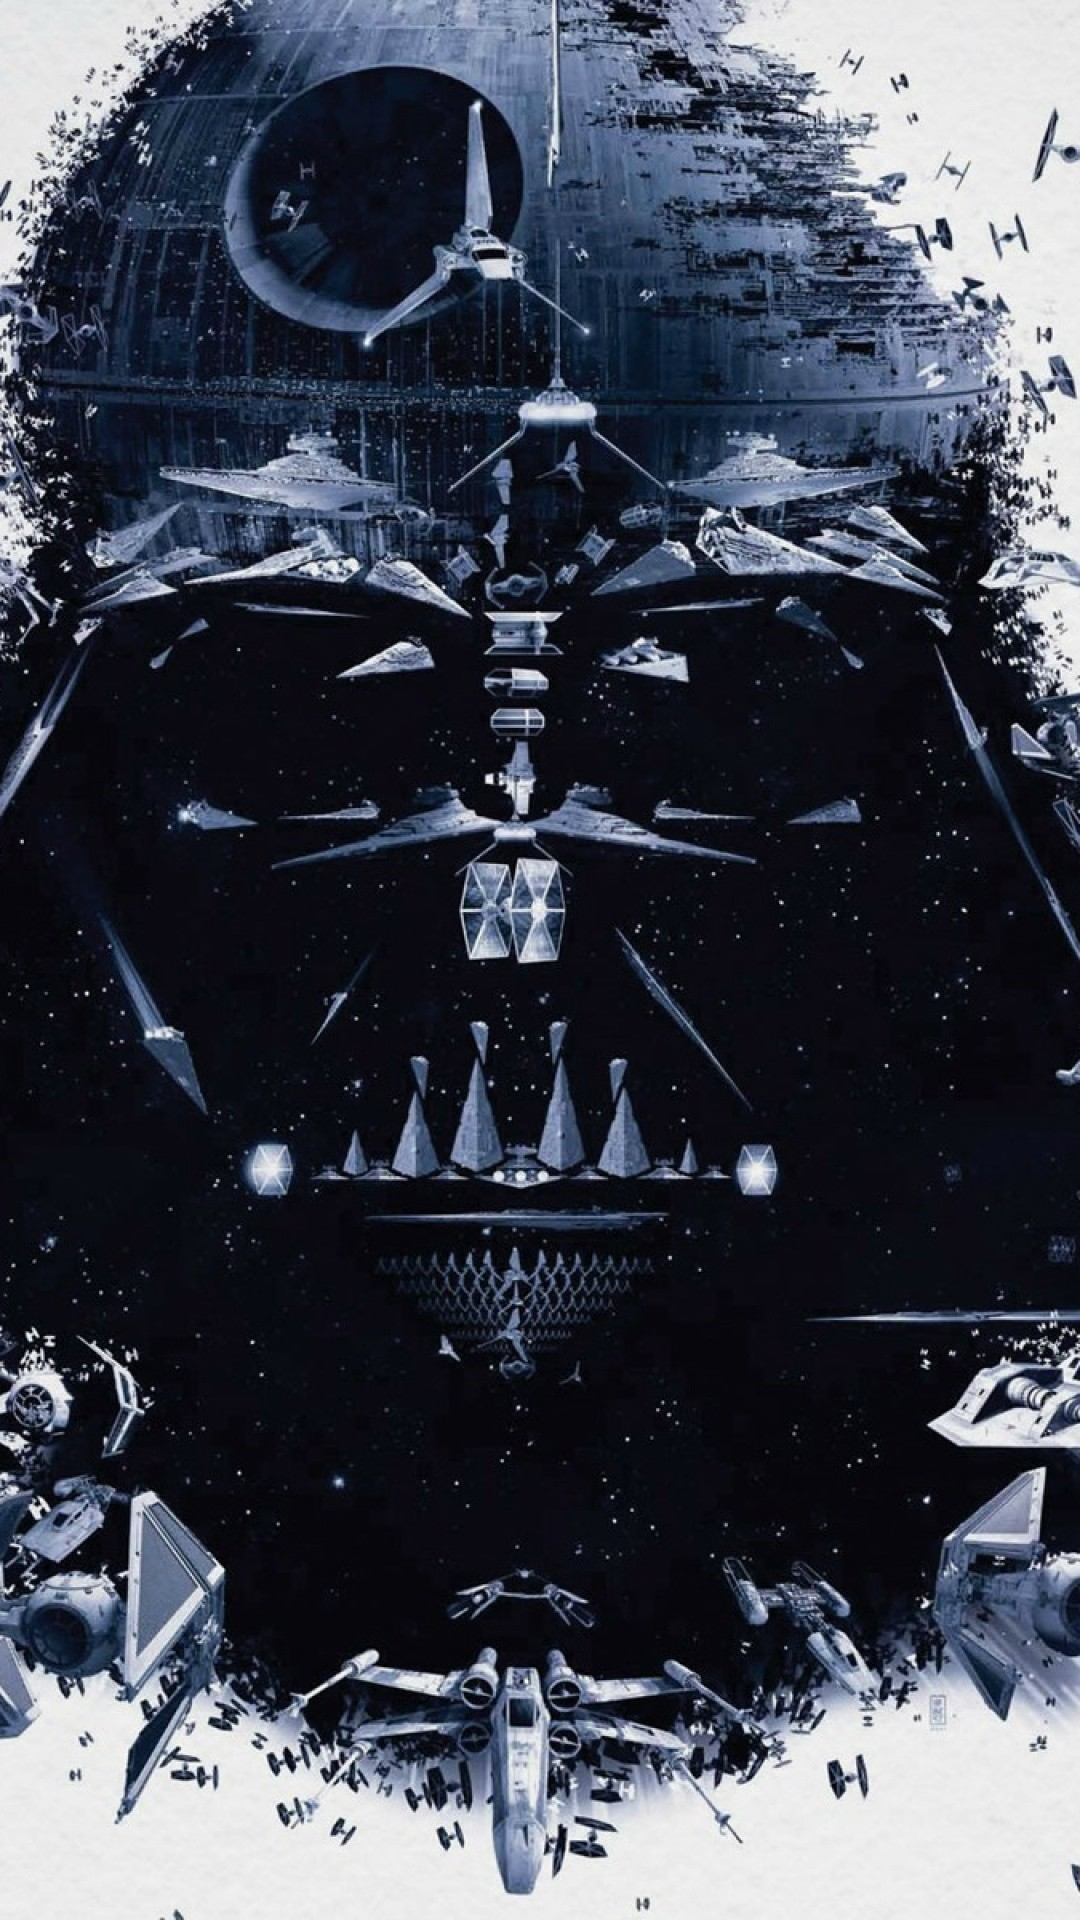 Star Wars Darth Vader Spaceships iPhone 6 Plus HD Wallpaper …